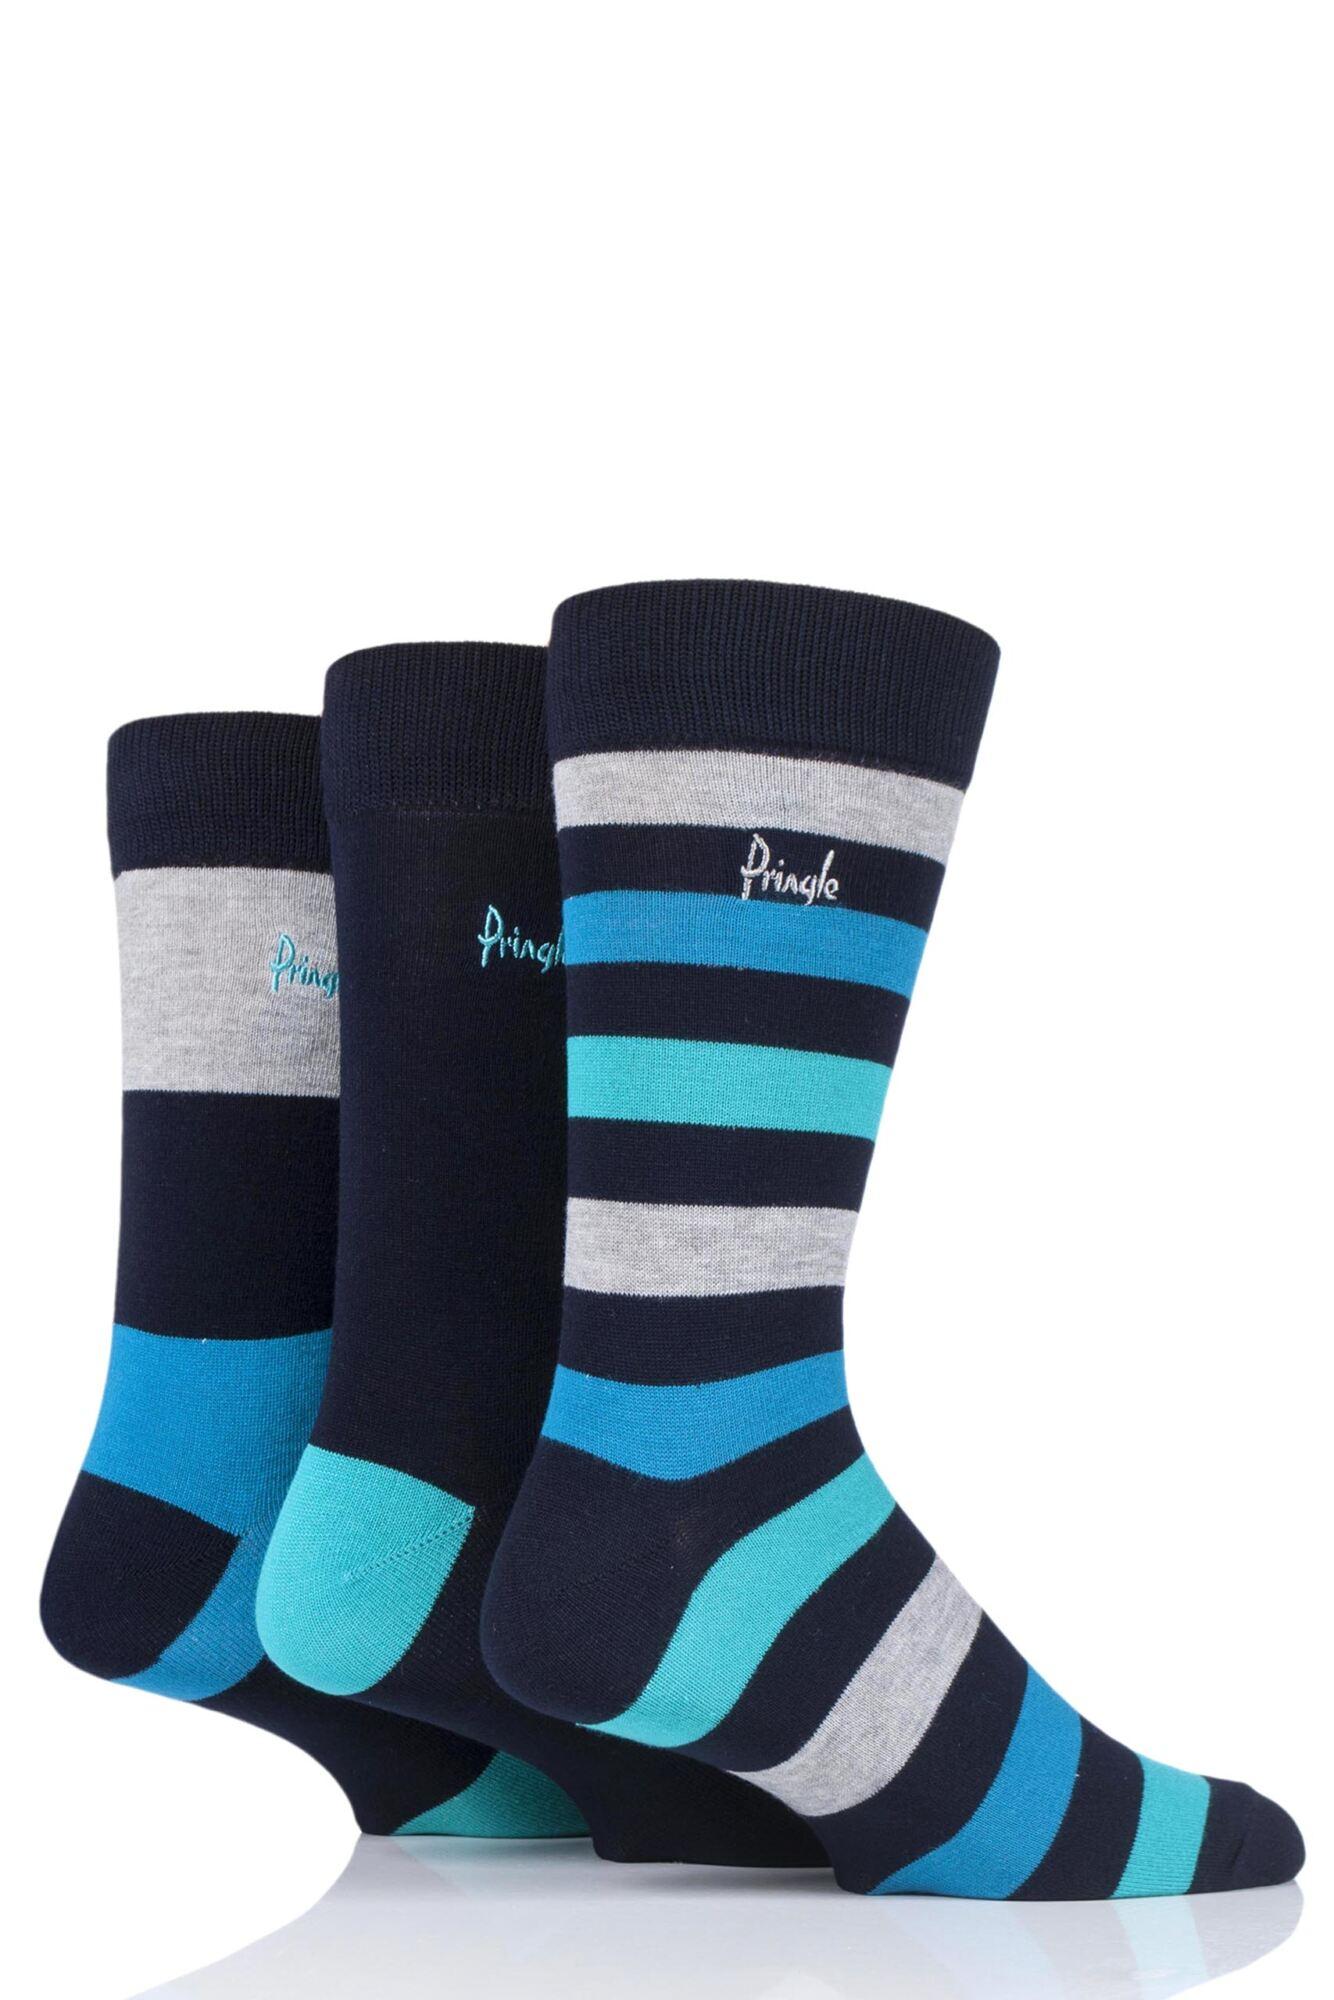 3 Pair Mike Striped Bamboo Socks Men's - Pringle